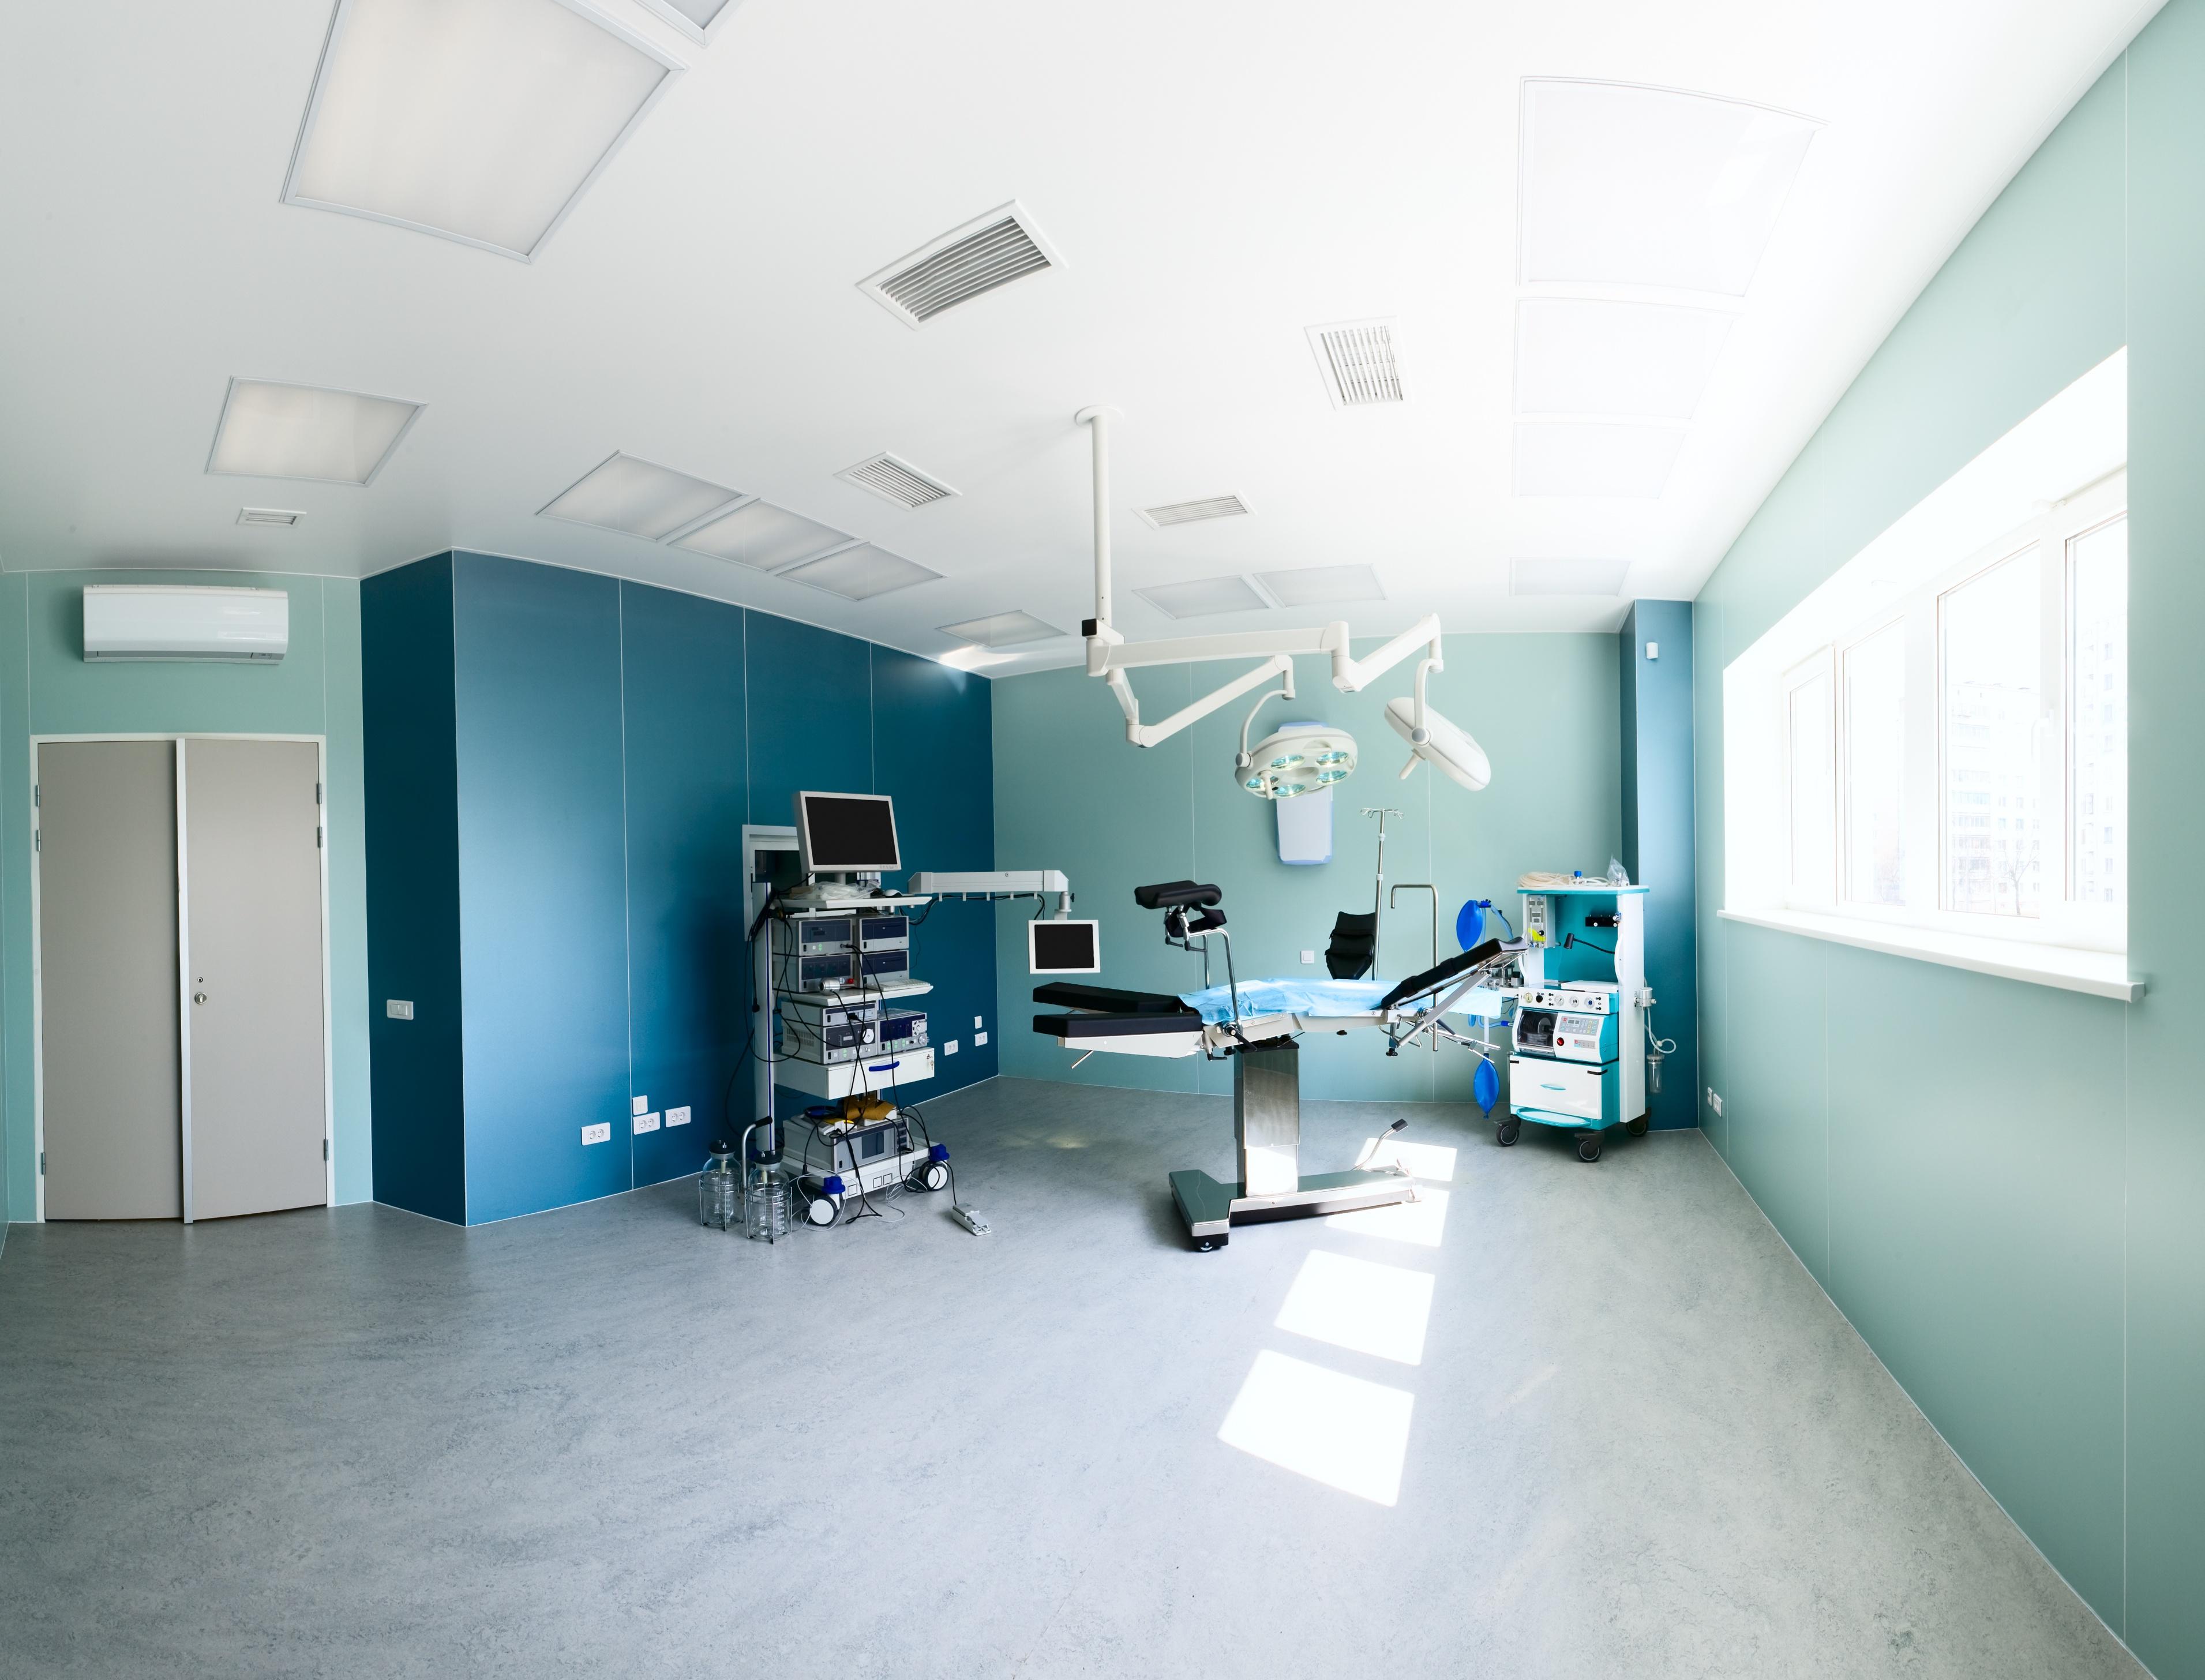 Building_Automation-Critical_Environments-Healthcare.jpg